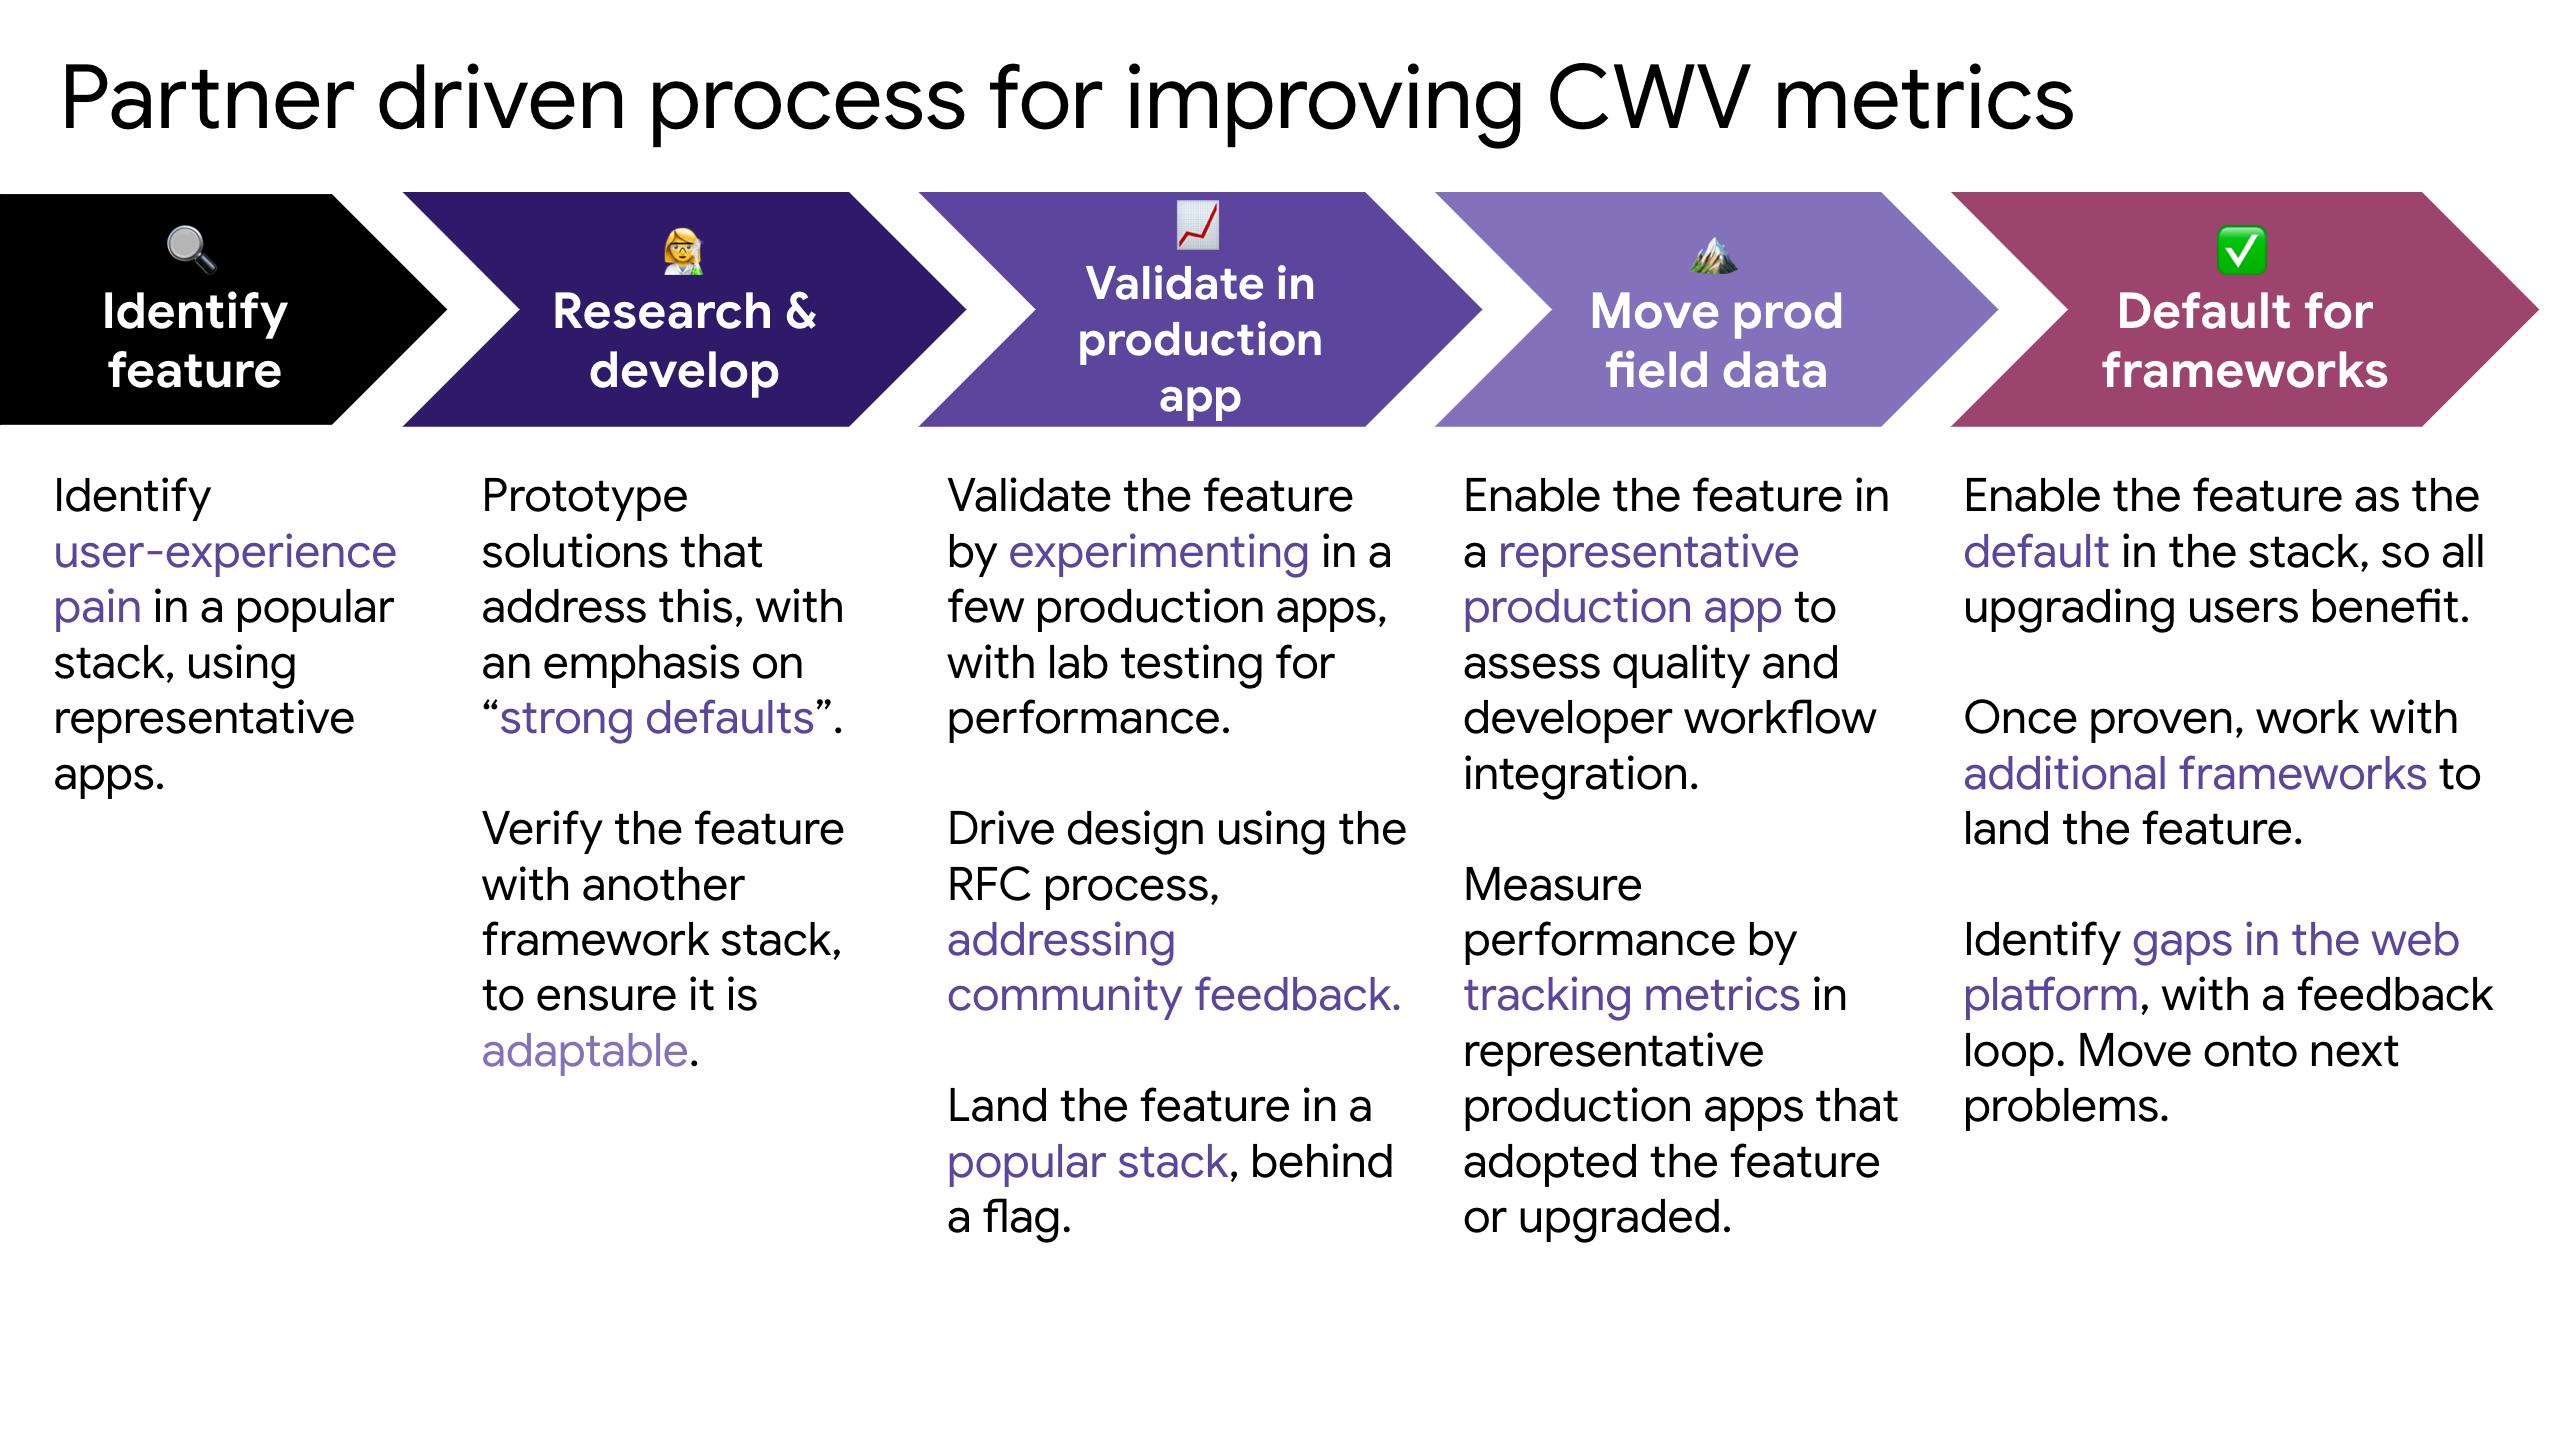 Aurora's partner driven process for improving Core Web Vital metrics